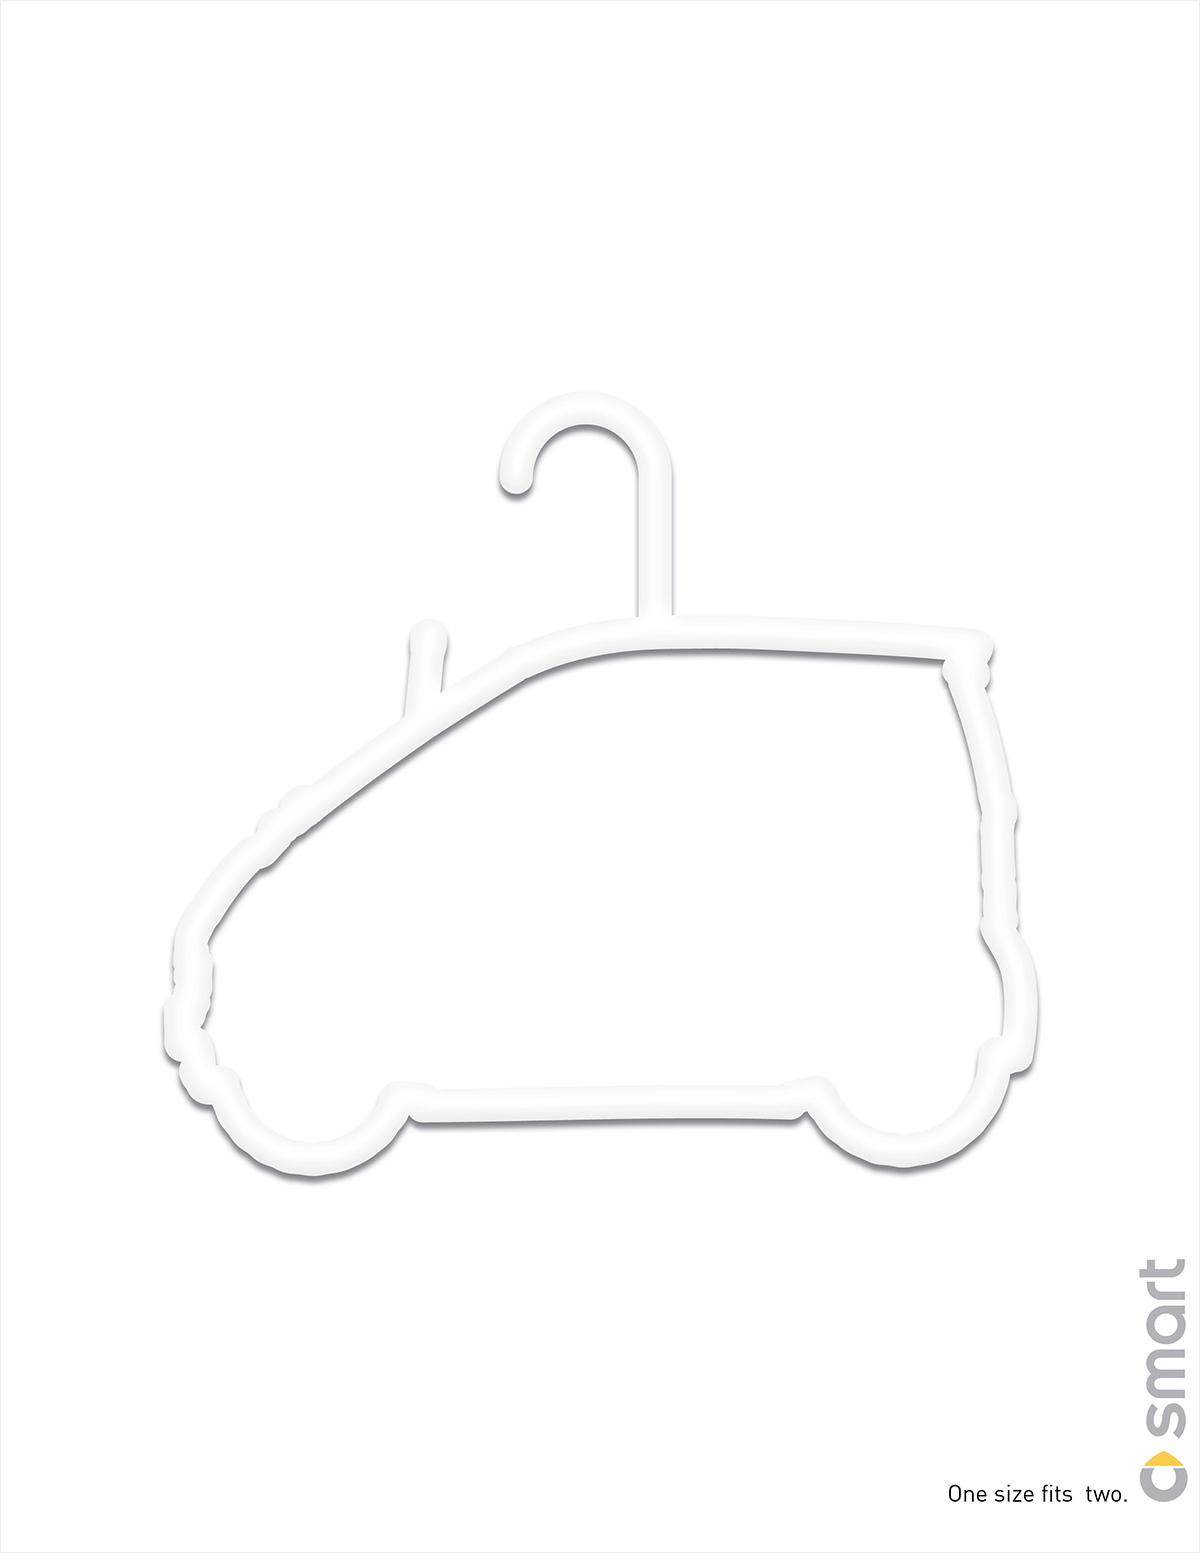 1.SmartCar.jpg